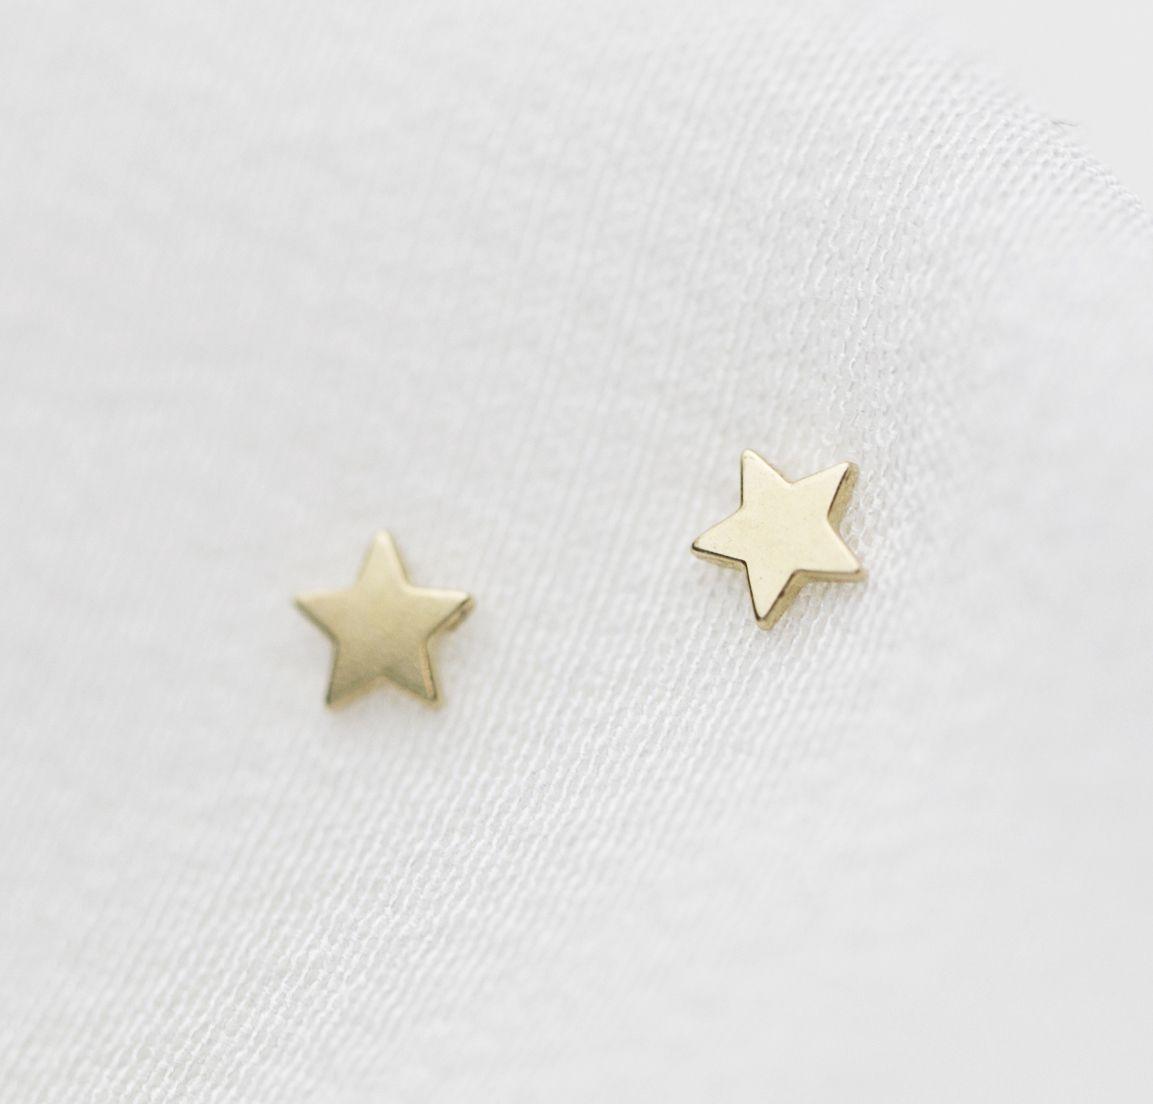 14K solid gold  Star stud Earrings -  under $50